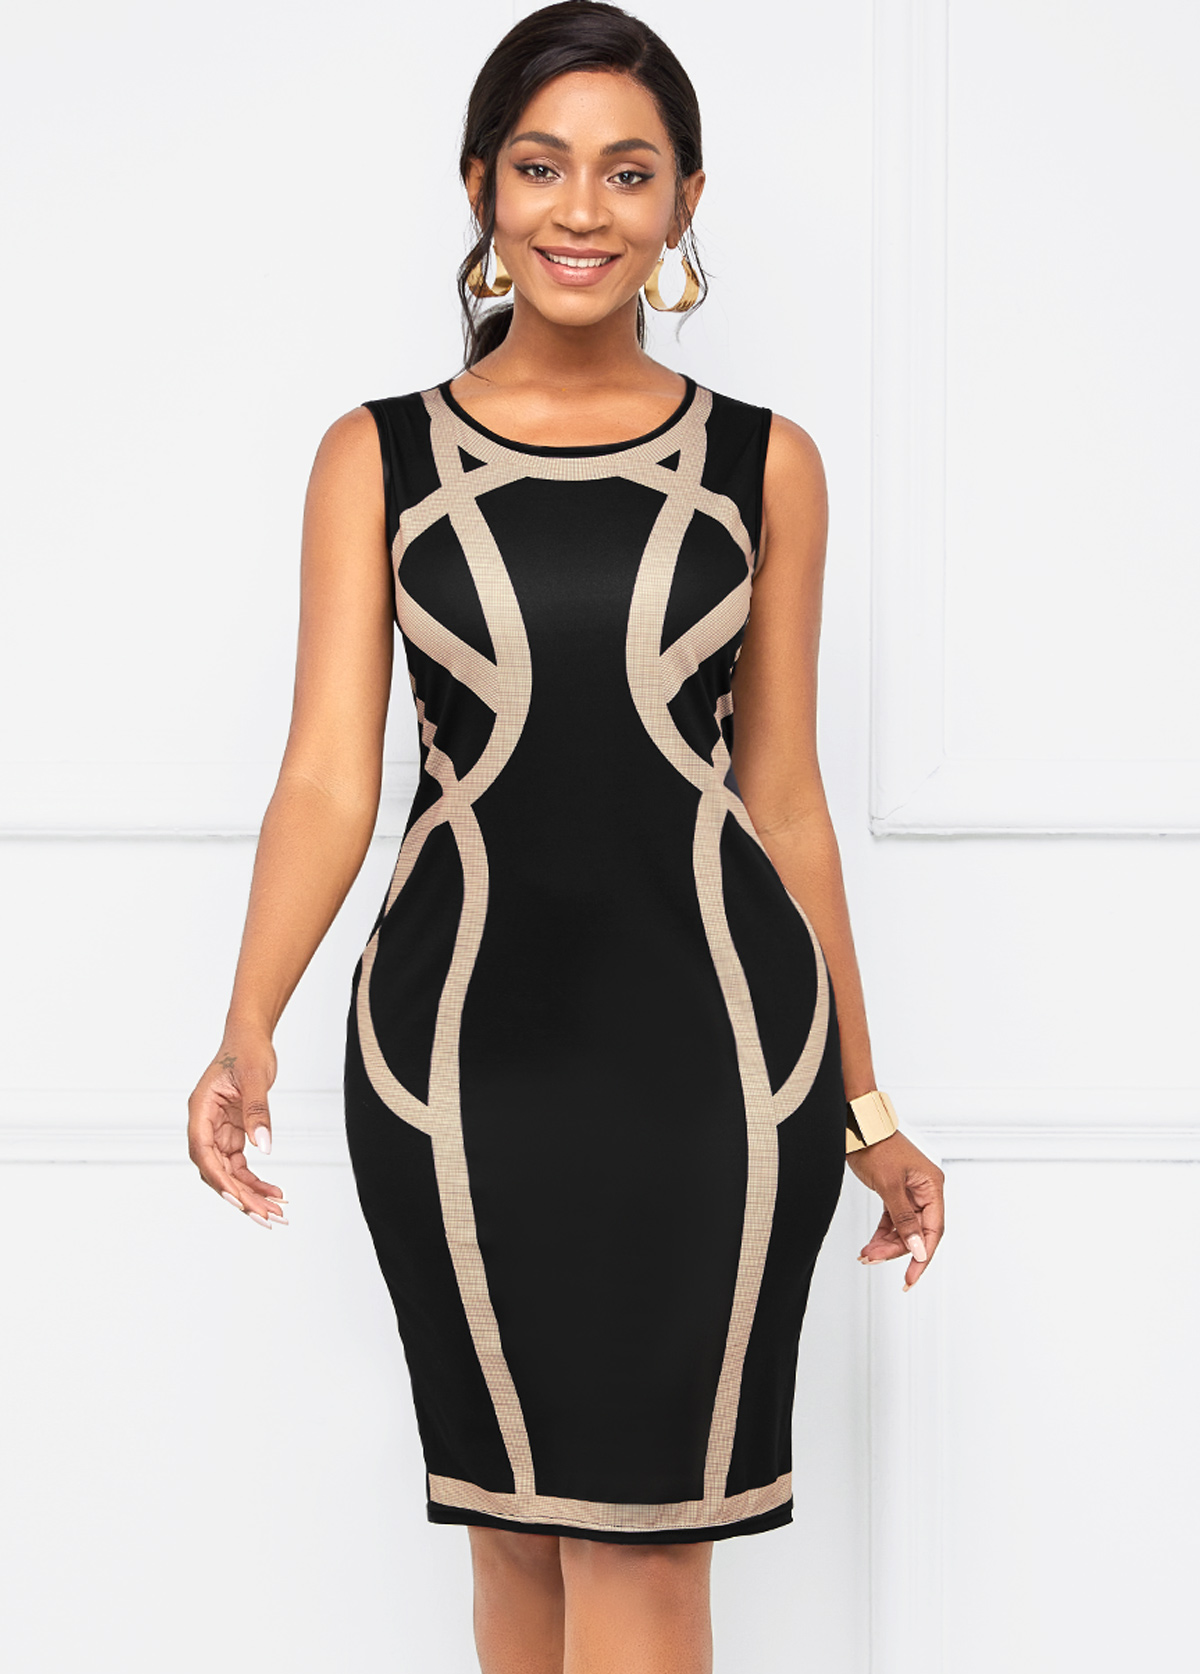 Contrast Round Neck Sleeveless Bodycon Dress